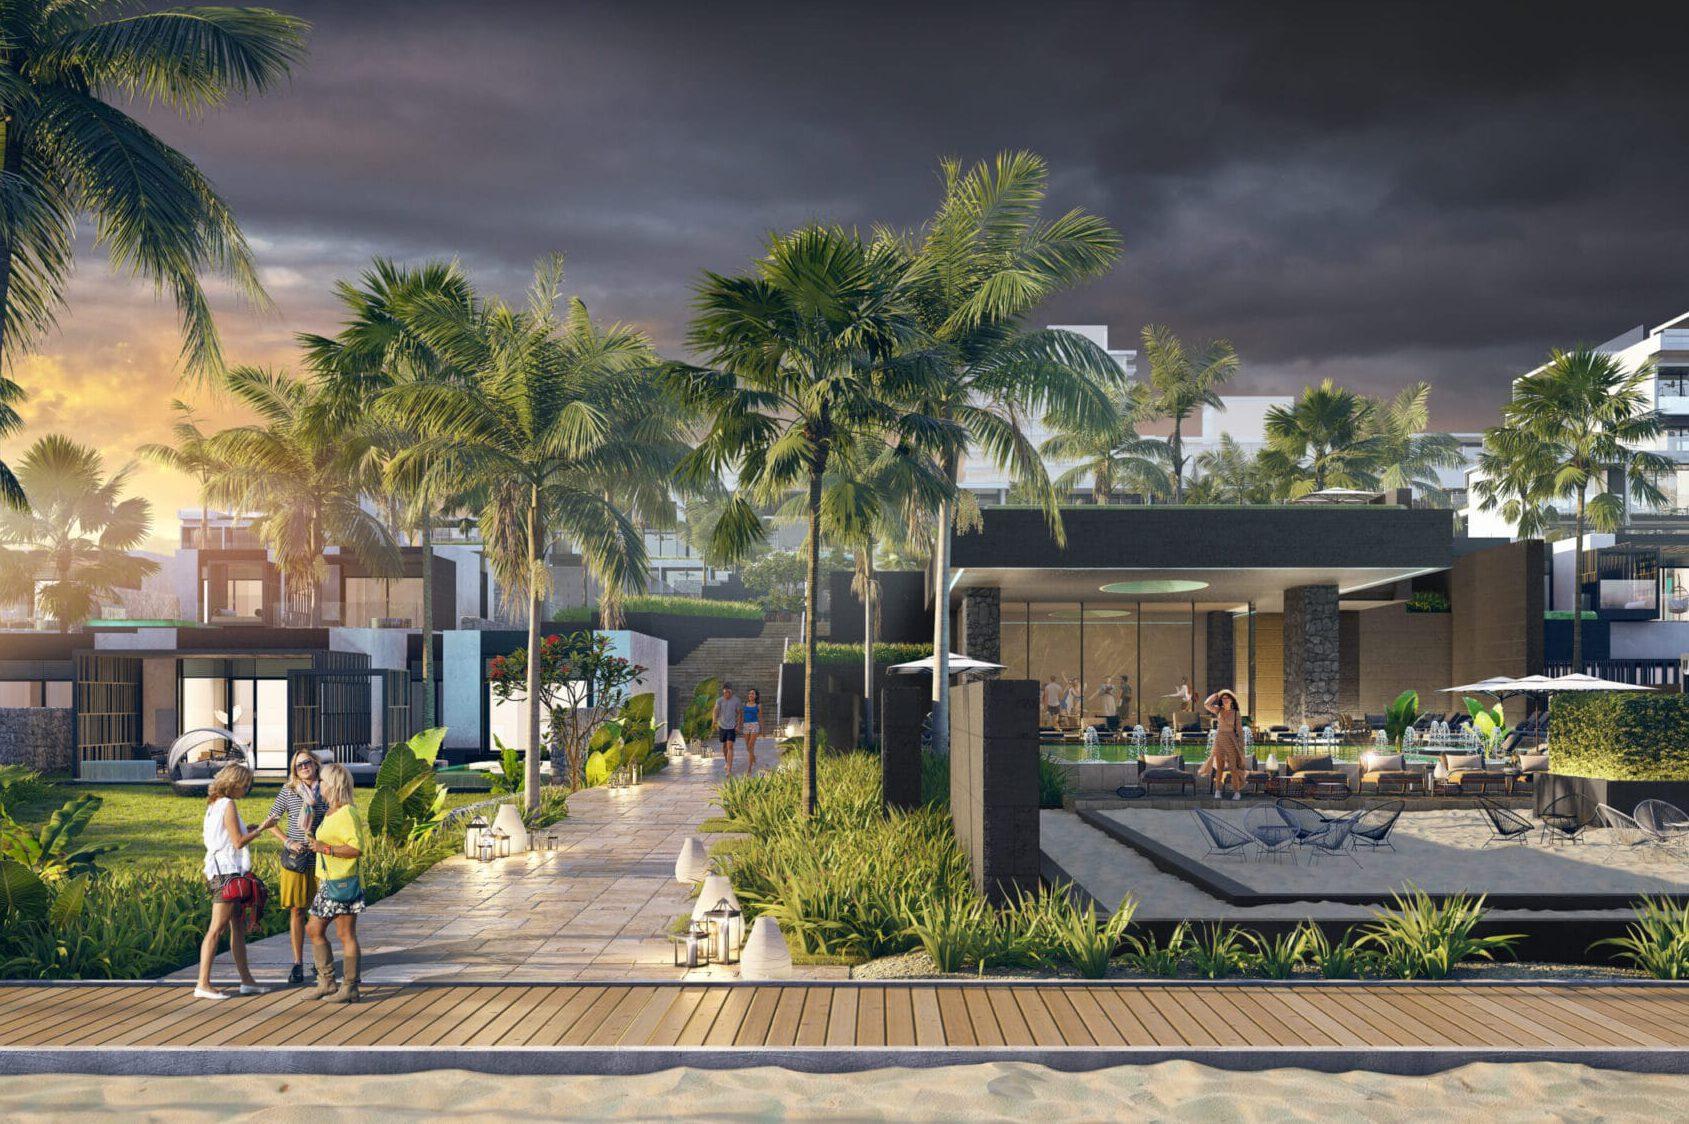 SOFITEL HOTEL CAM RANH VIETNAM